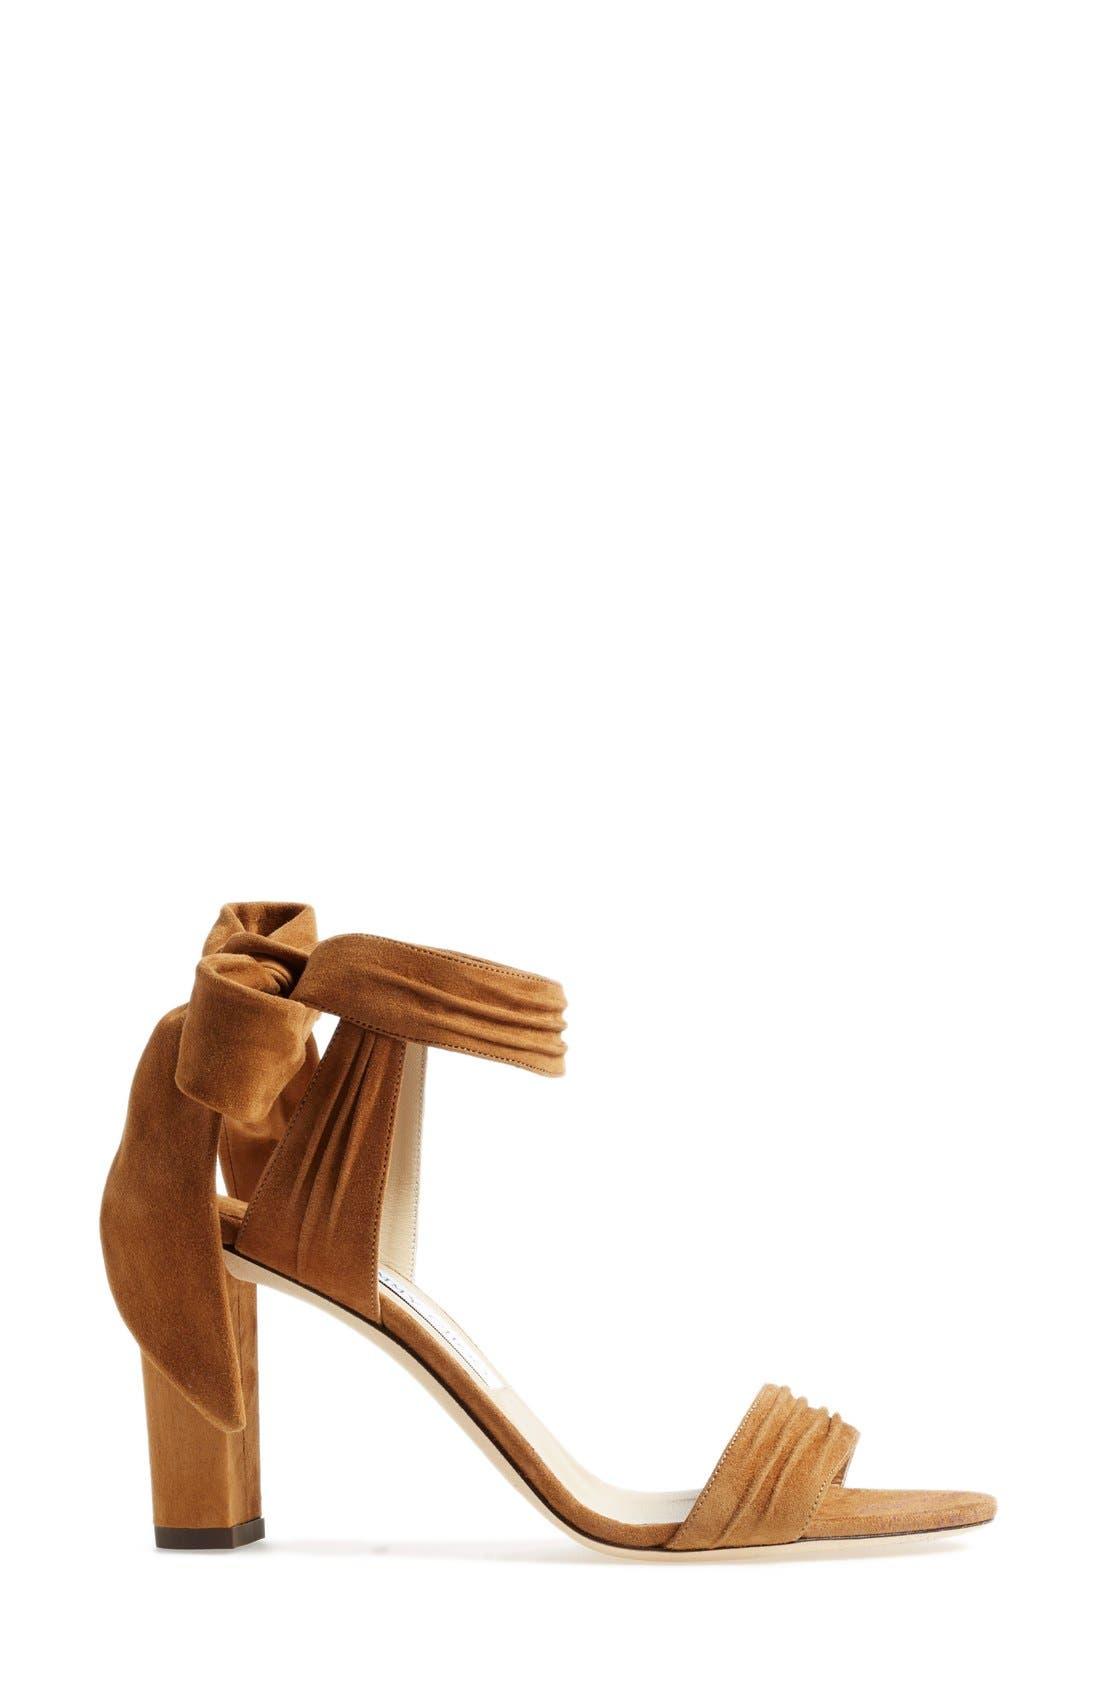 'Kora' Sandal,                             Alternate thumbnail 4, color,                             200